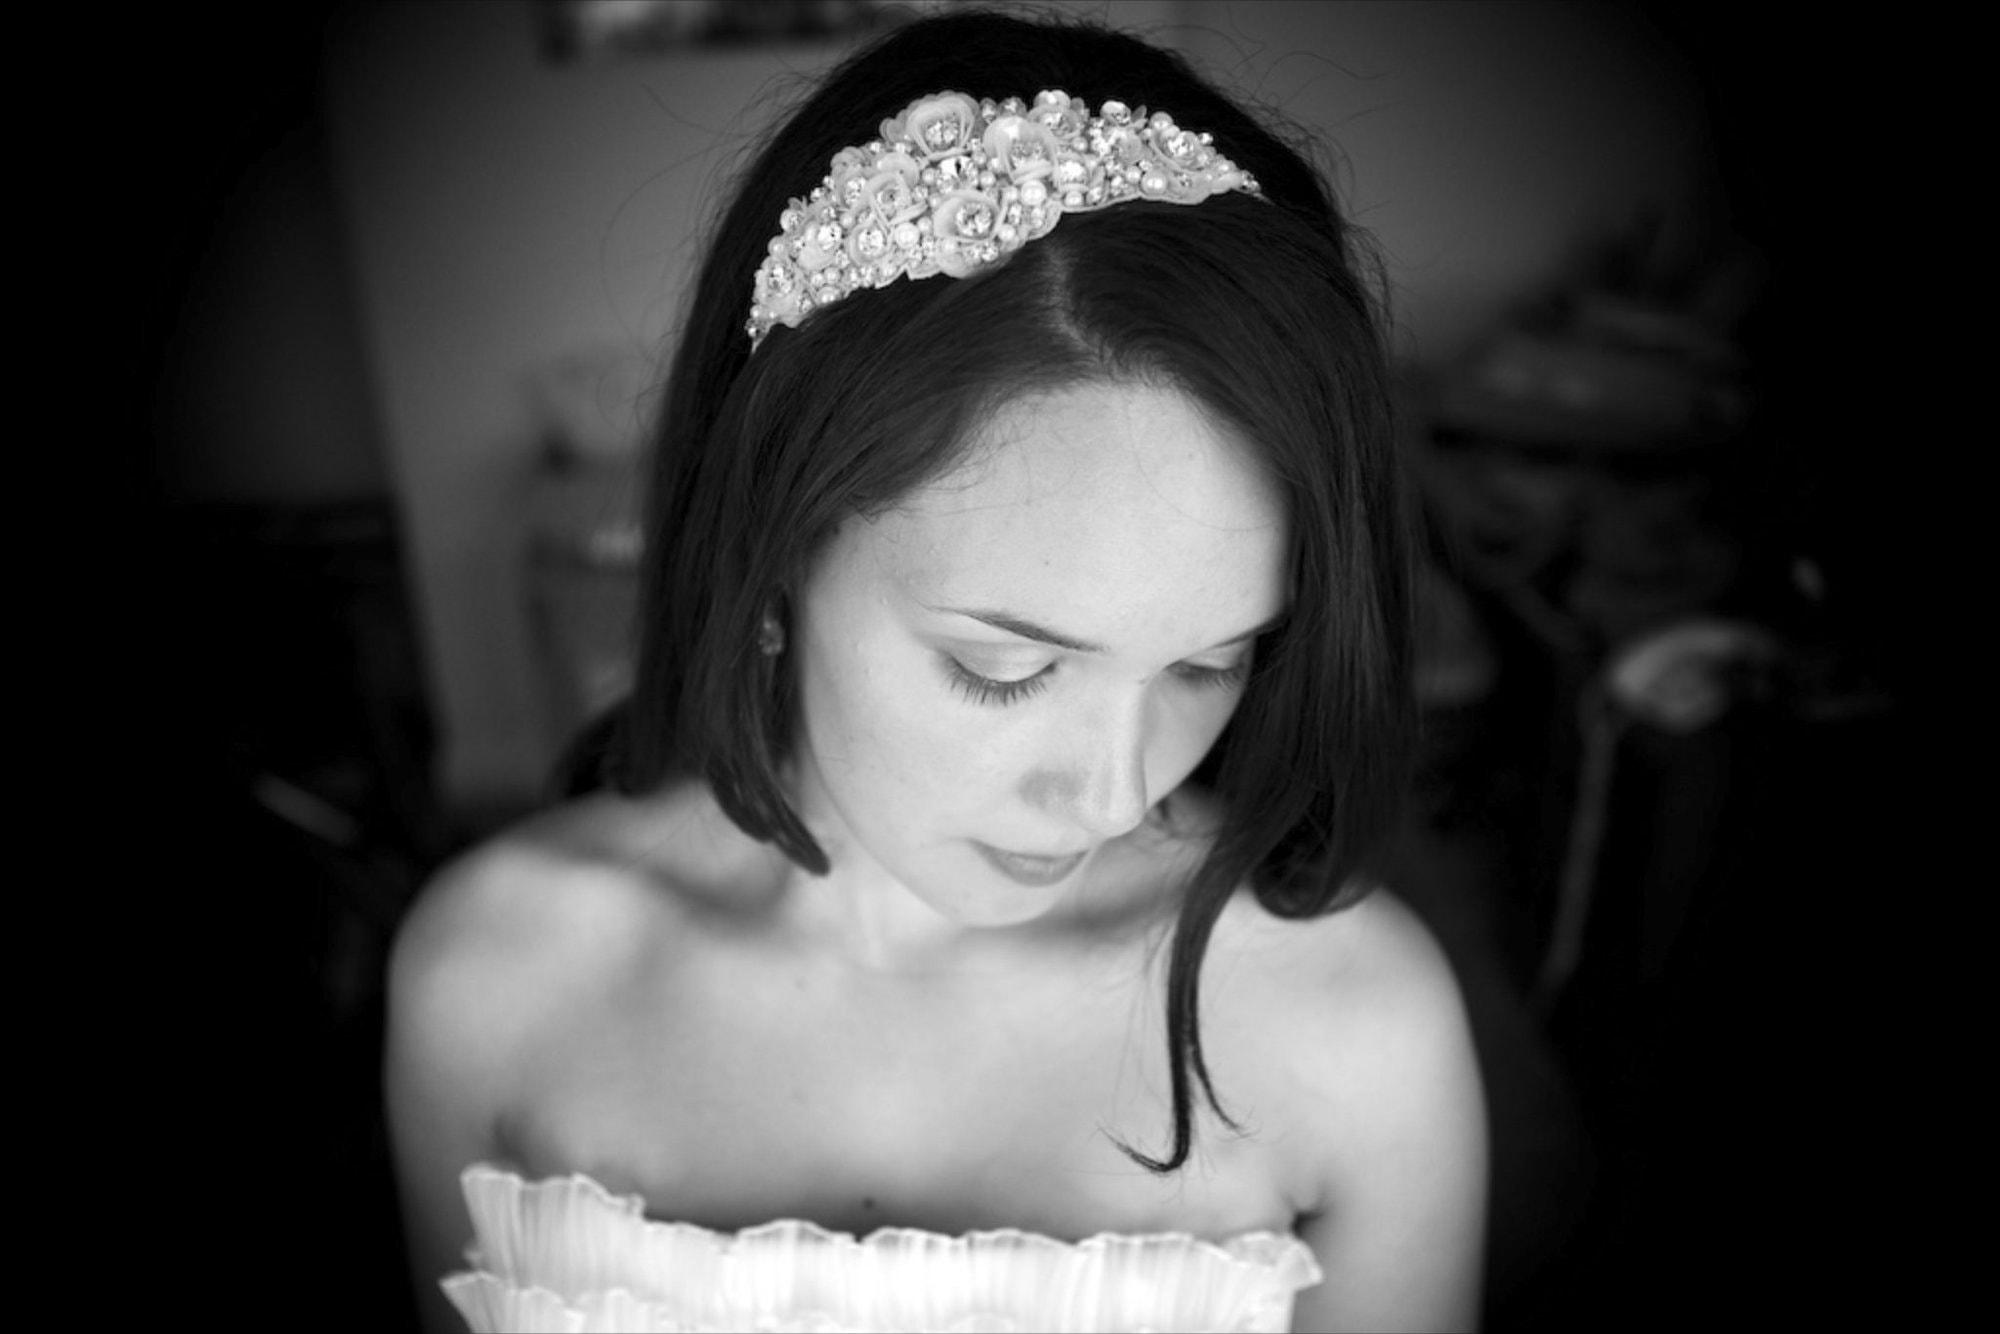 Bridal portrait before wedding taken by London wedding photographer